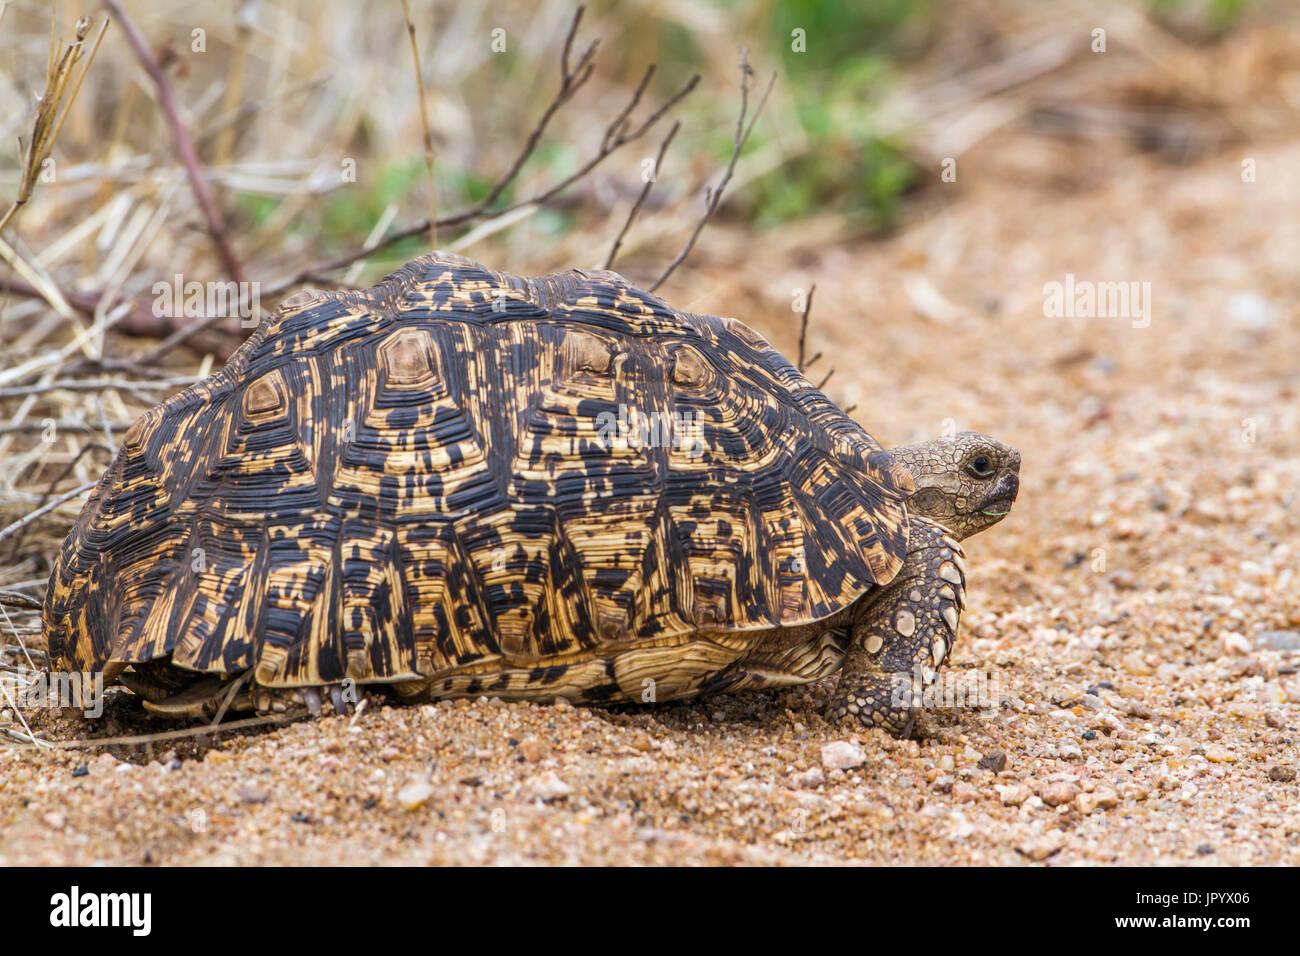 Leopard tortoise (Stigmochelys pardalis), Kruger National park, South Africa - Stock Image